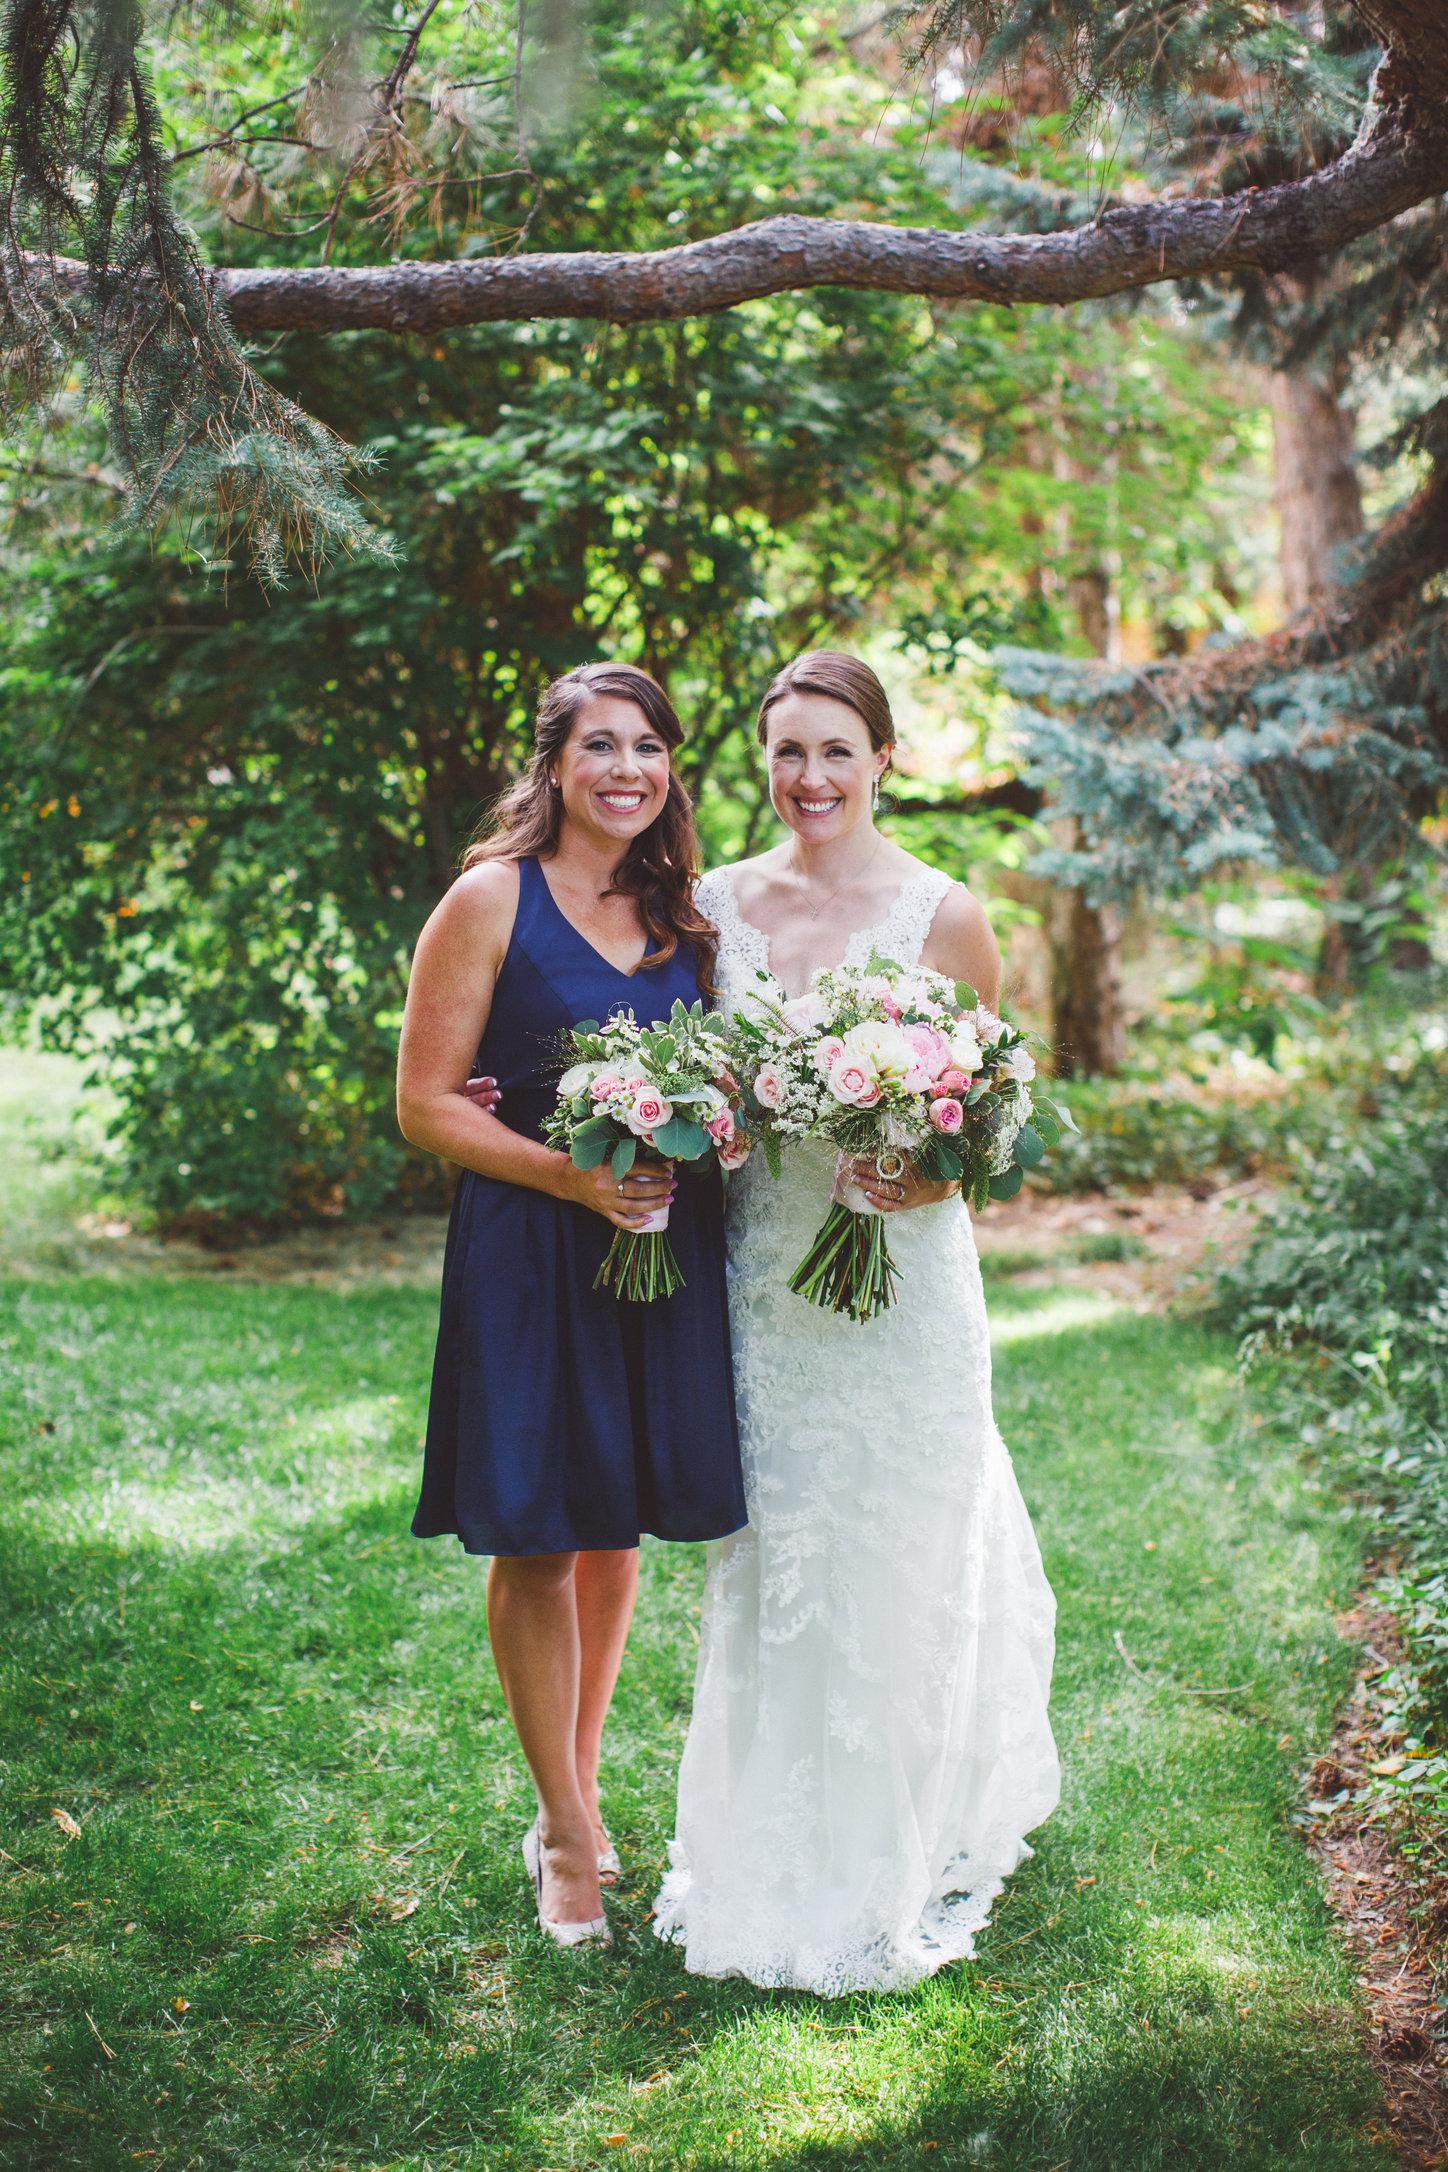 SandC-wedding-362.jpg